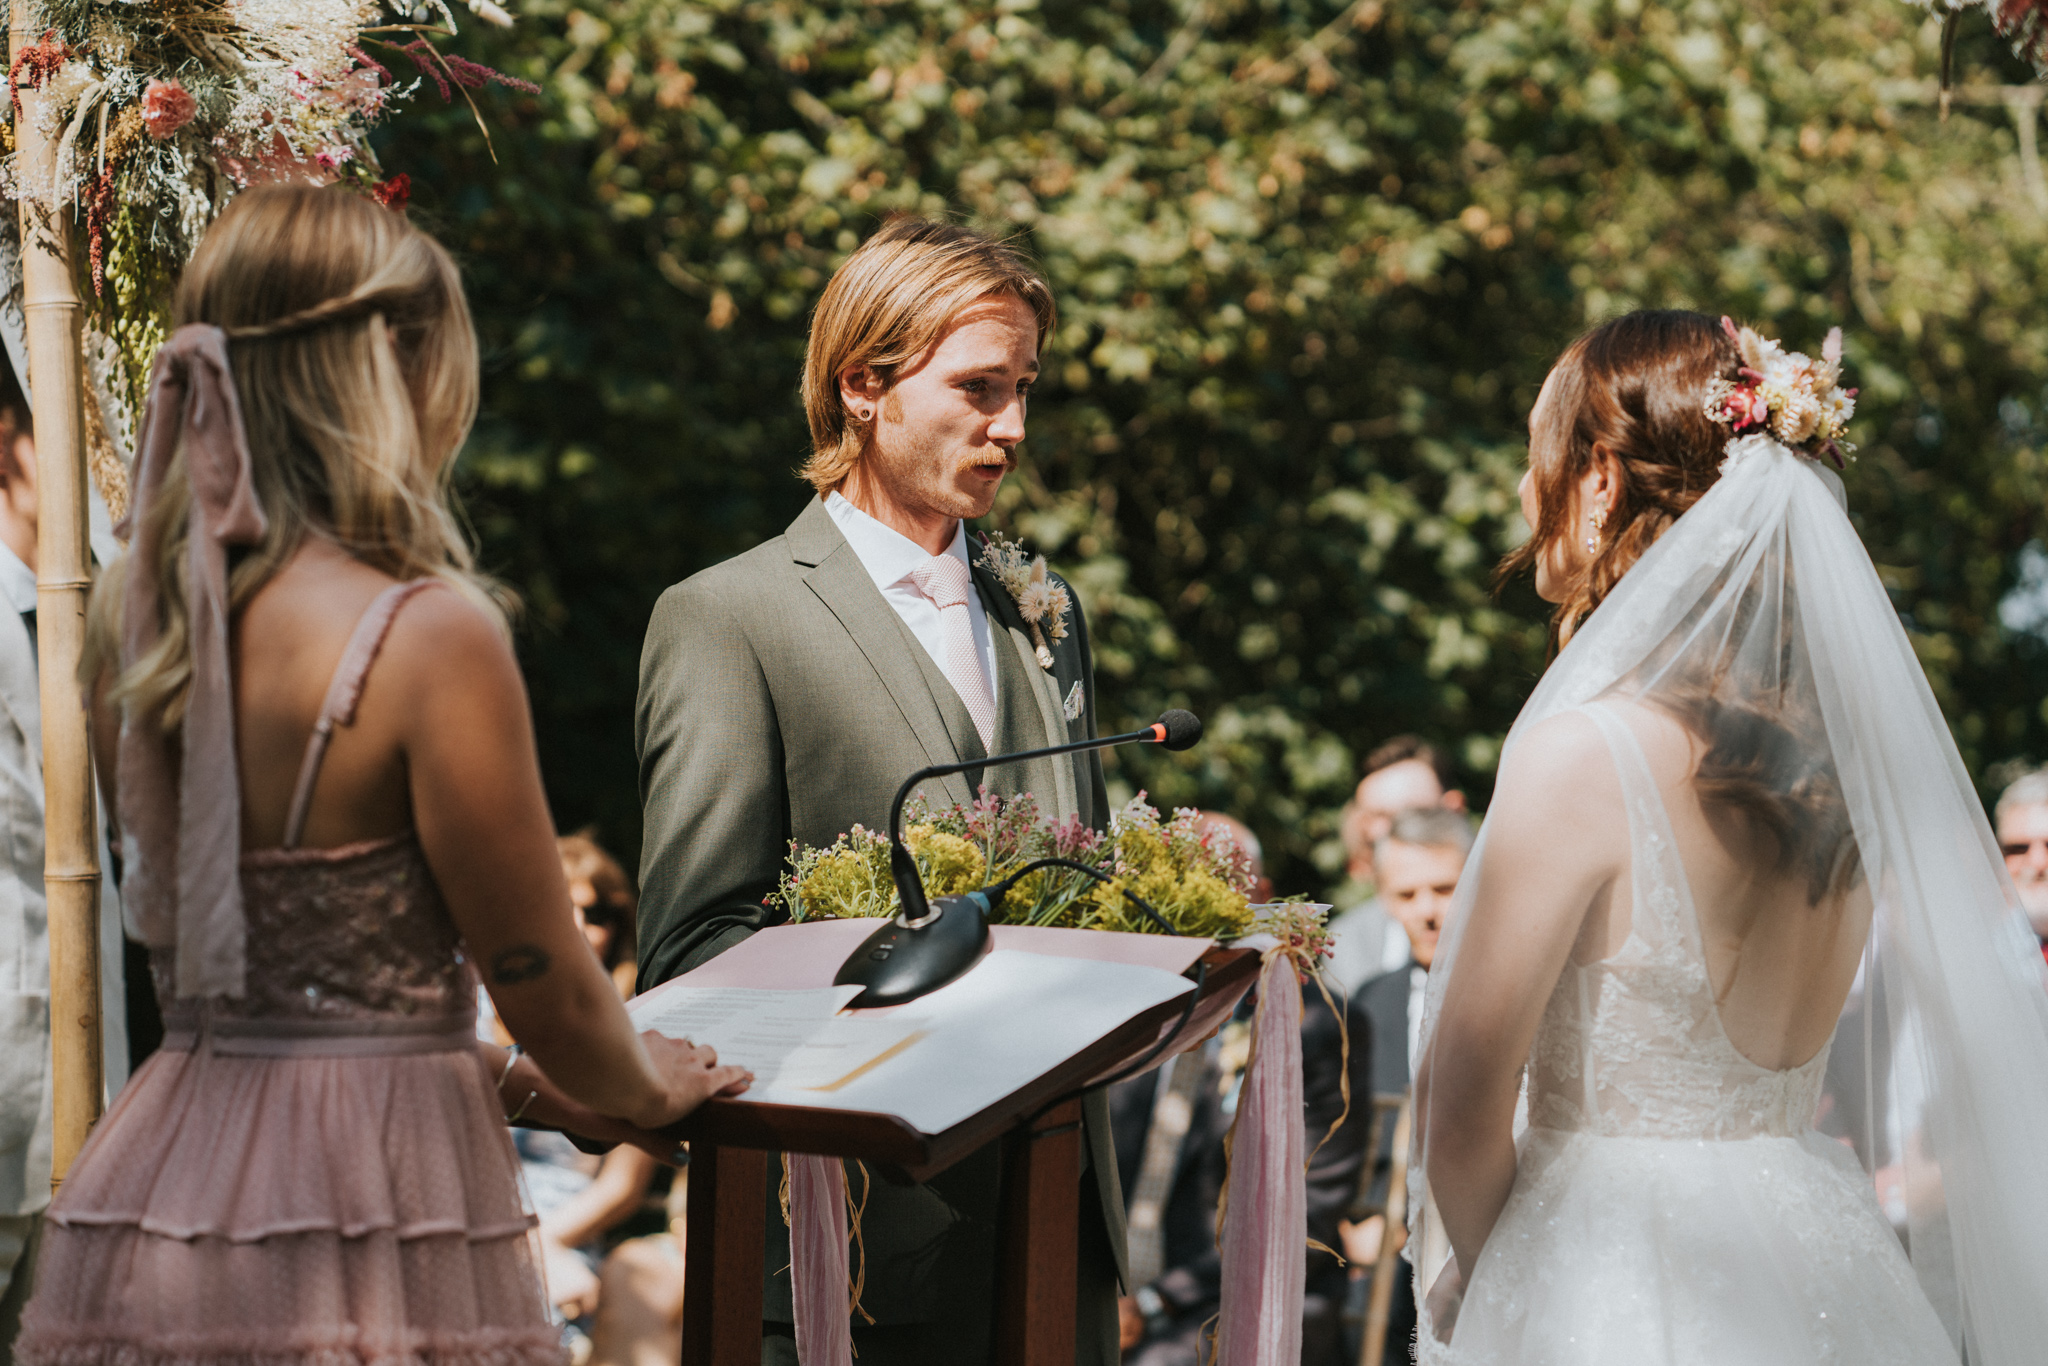 emi-Jack-boho-diy-wedding-eggington-house-grace-elizabeth-colchester-essex-alternative-wedding-photographer-suffolk-norfolk-devon (17 of 56).jpg